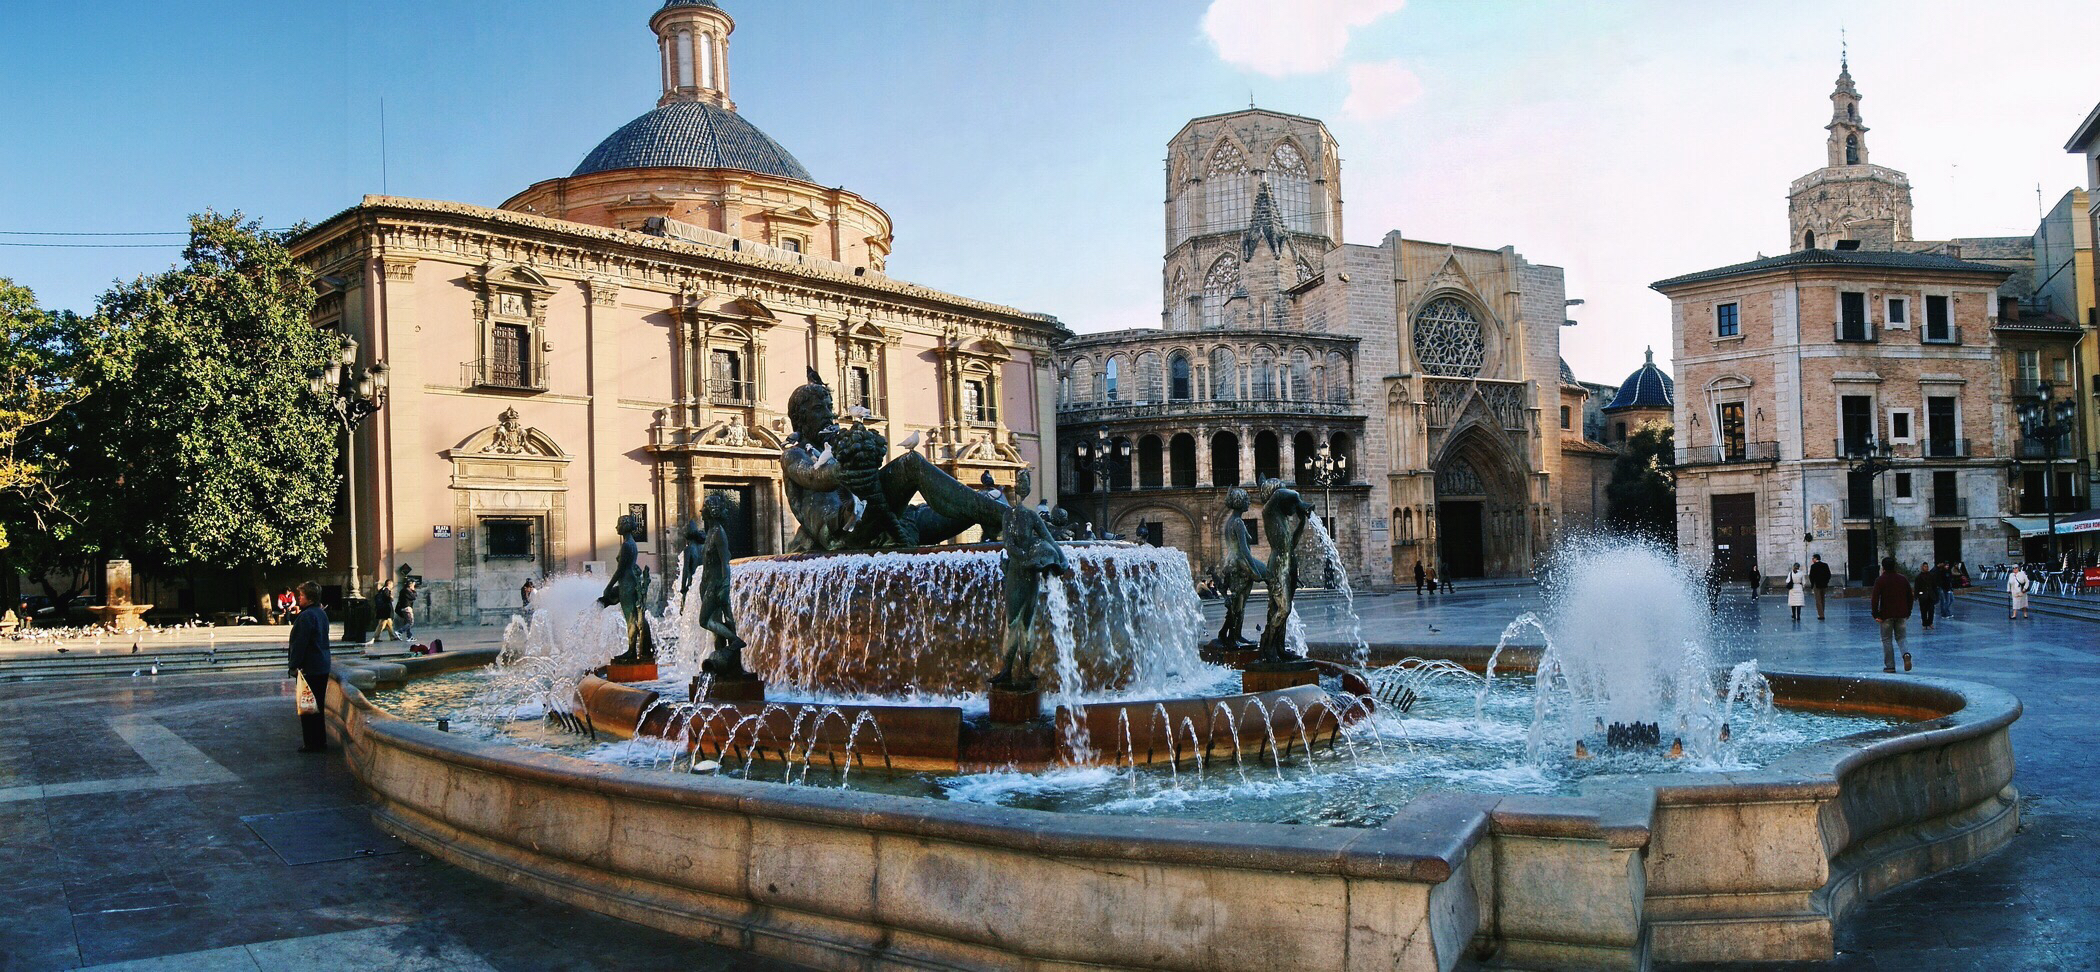 Astute Destinations | Valencia | Plaza de la Virgen | Fountain | Luxury Travel | Jet Sharper